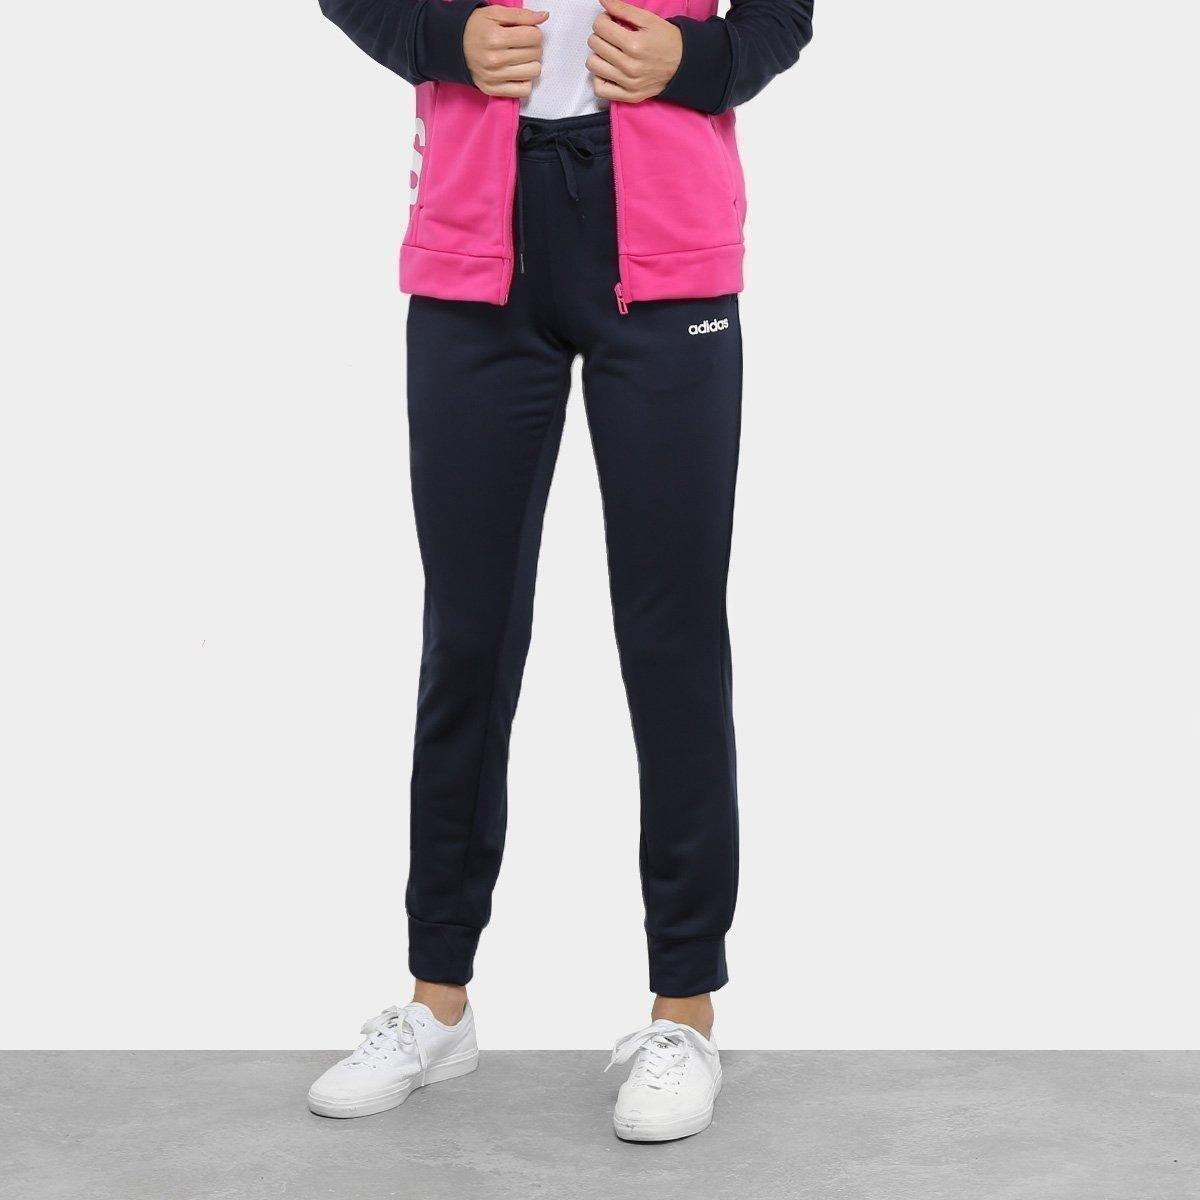 6d96863ab2 ... Conjunto Agasalho Adidas Detalhe Logo WTS Lin FT Hood Feminino - 3